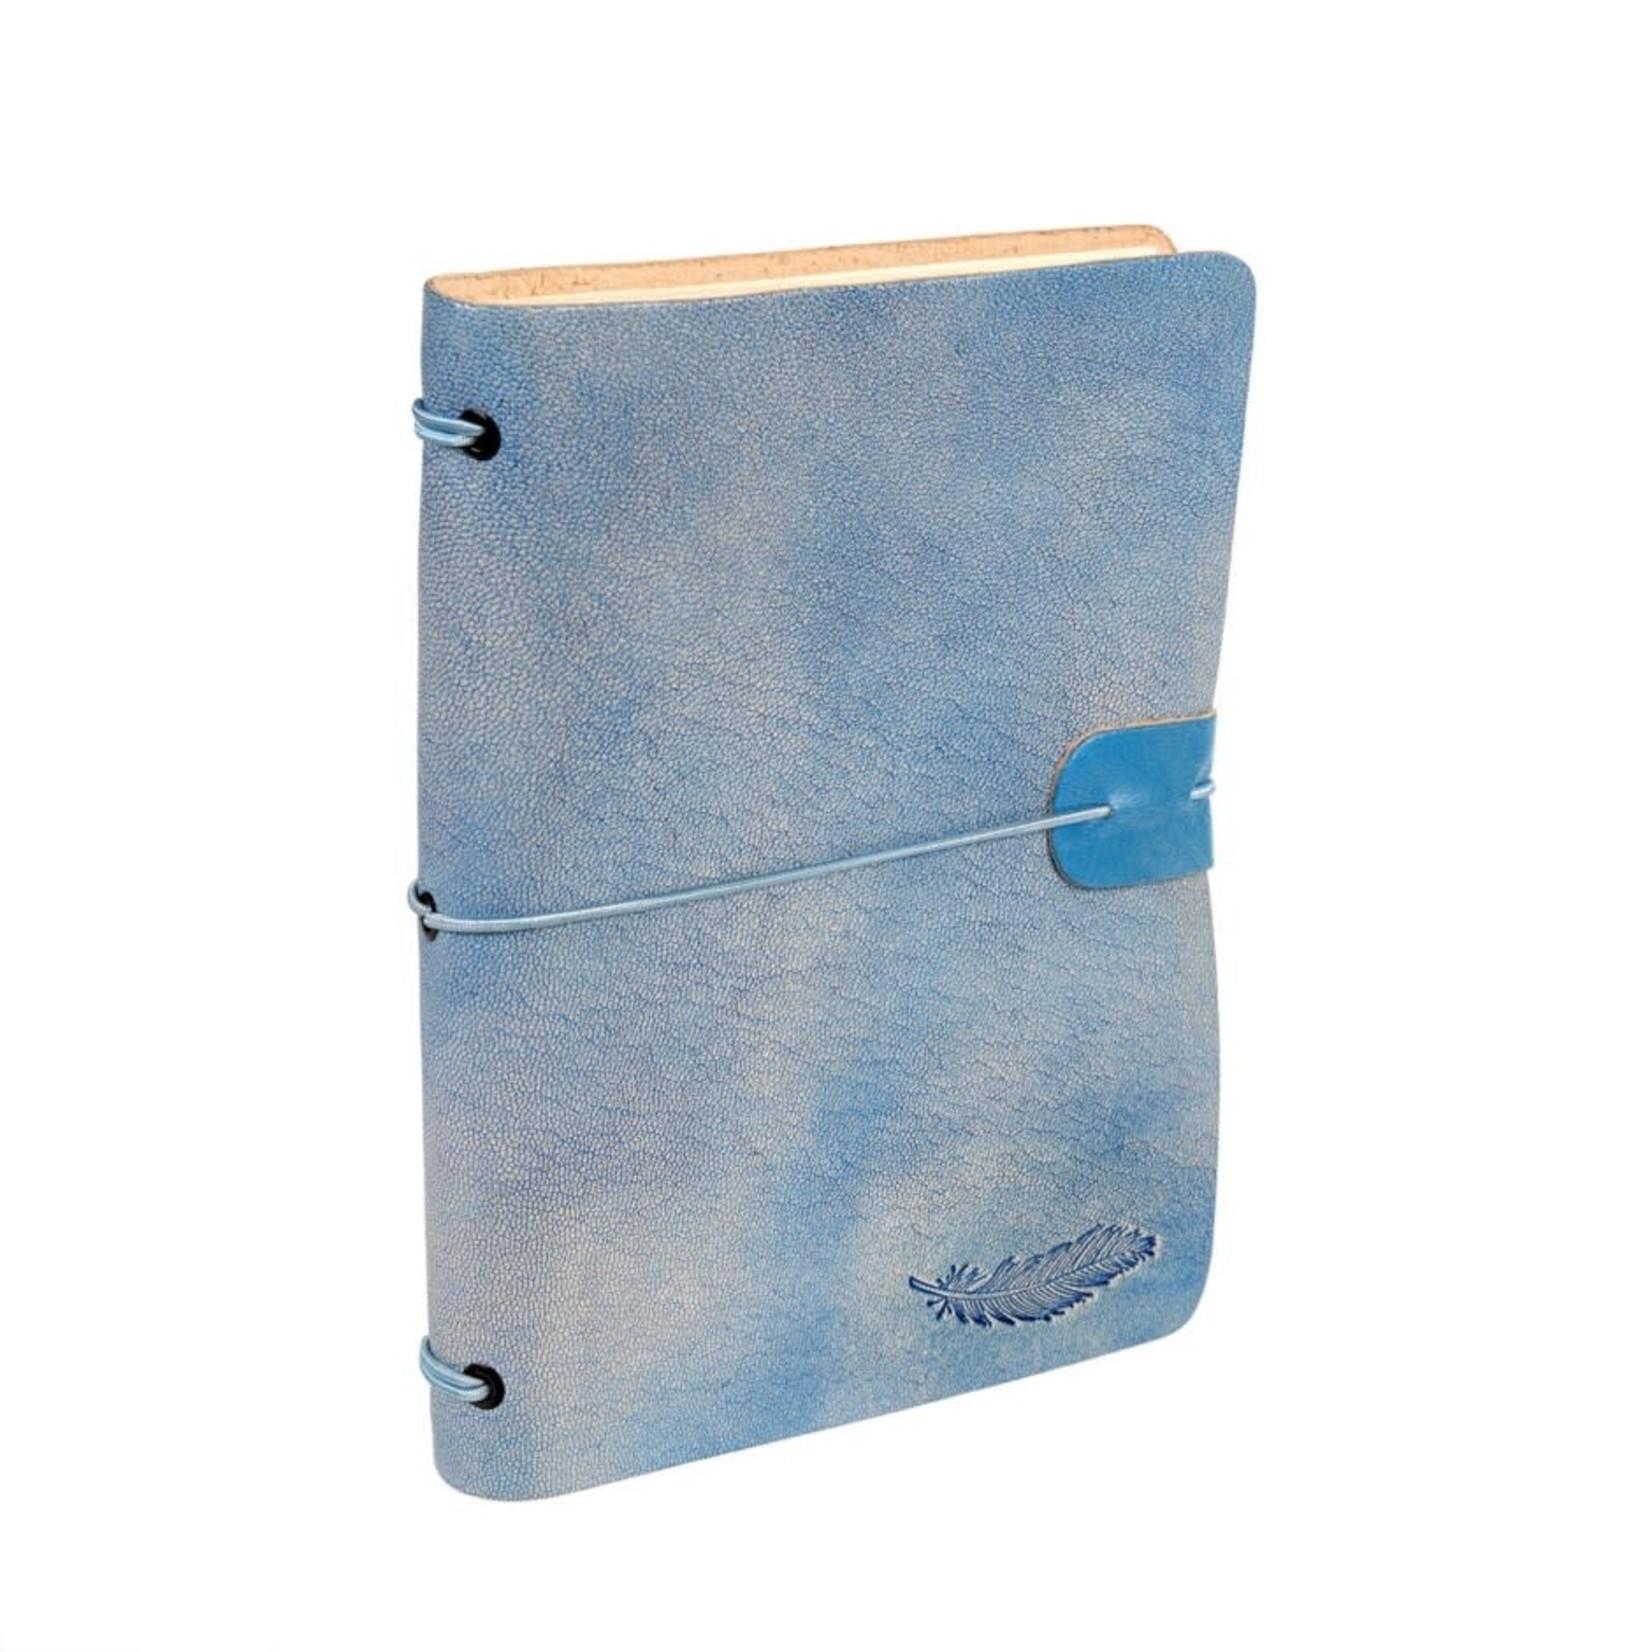 Leatherbound Notebook -  Light Denim